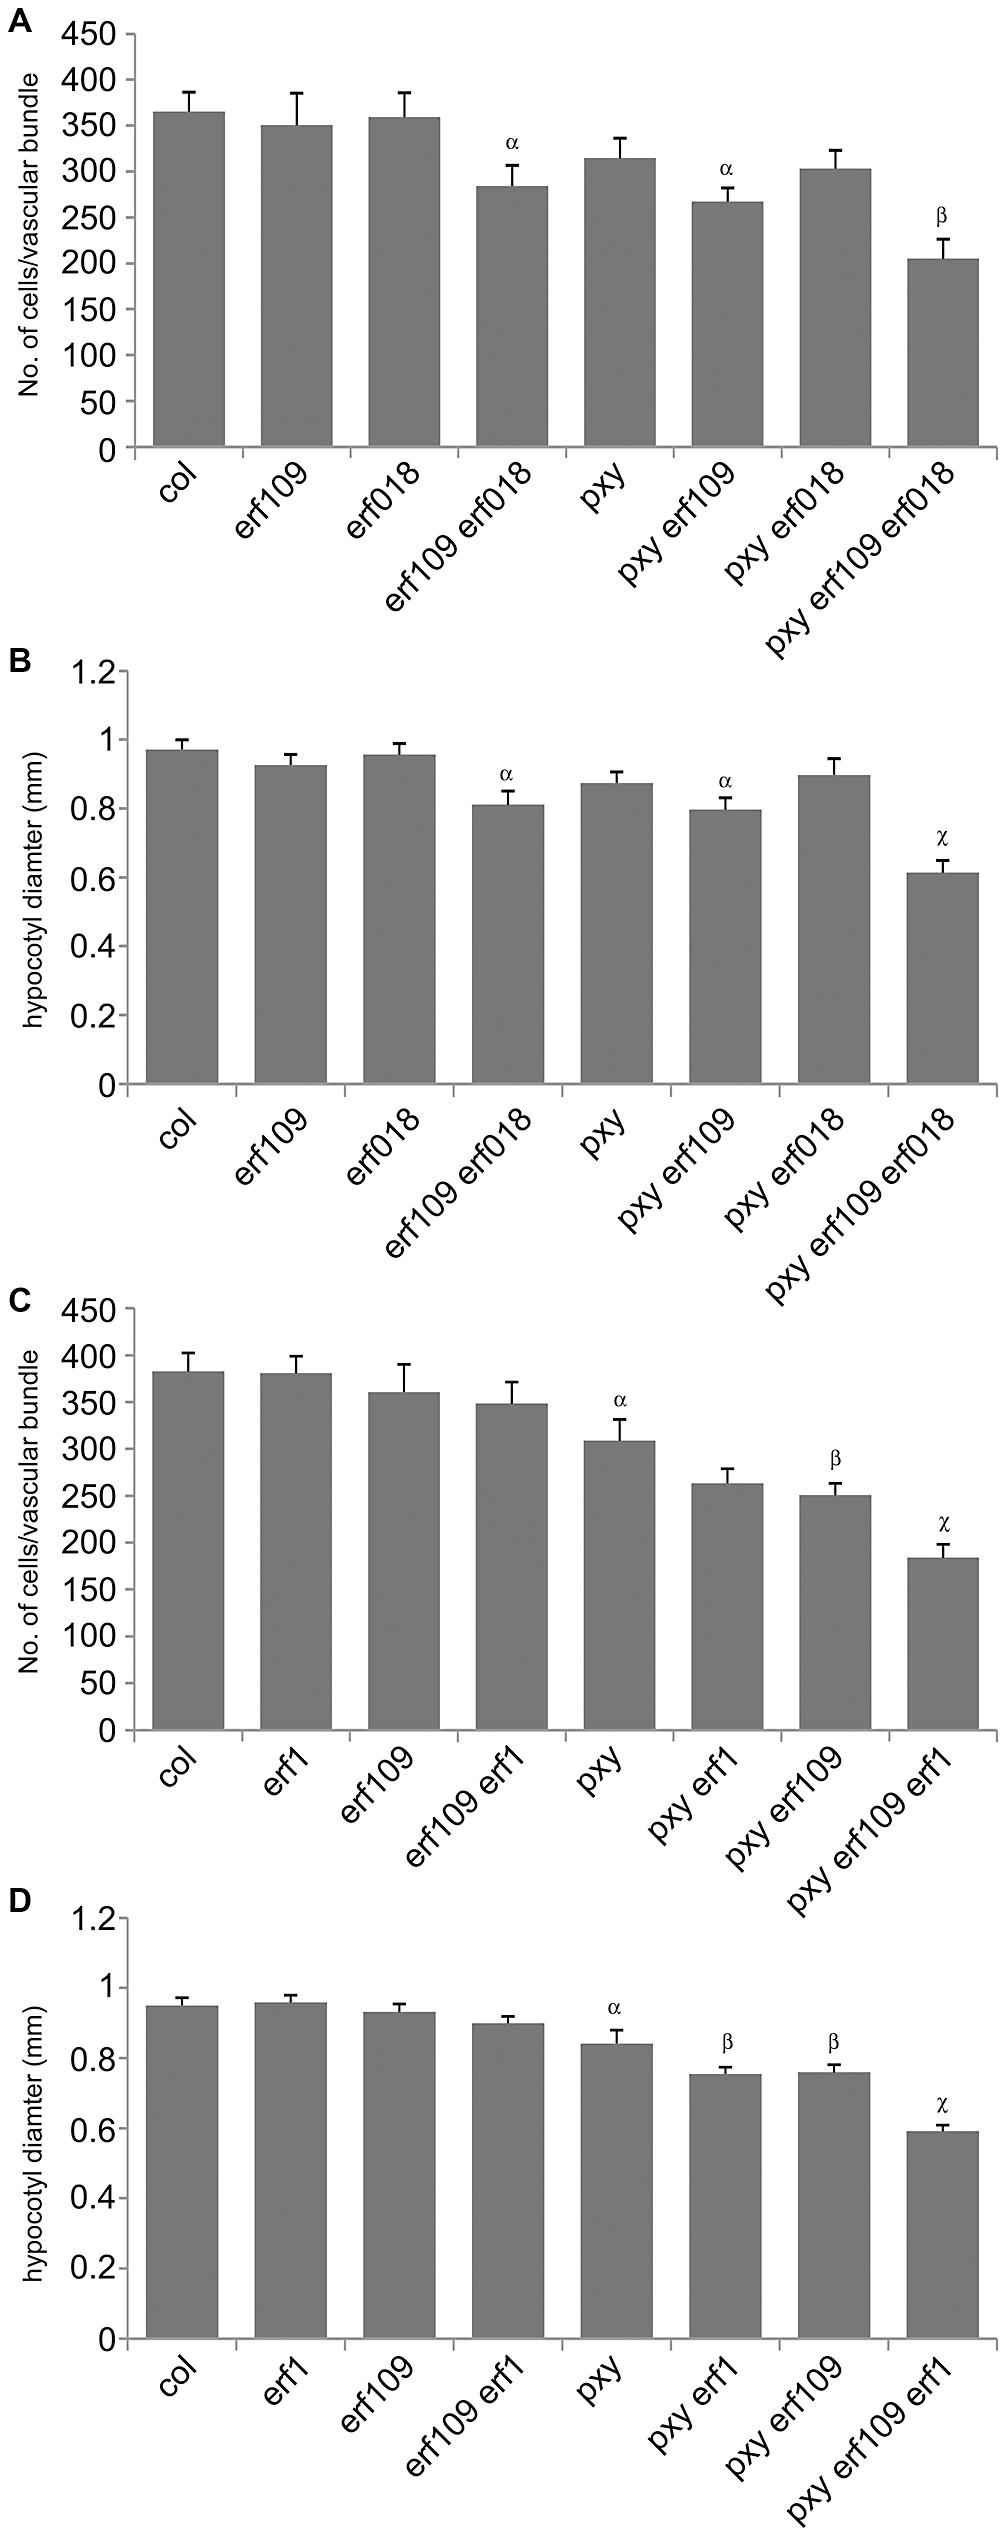 Quantitative analysis of vascular cell division in <i>erf109</i>, <i>erf018</i>, <i>erf1</i>, and <i>pxy</i> mutant combinations.